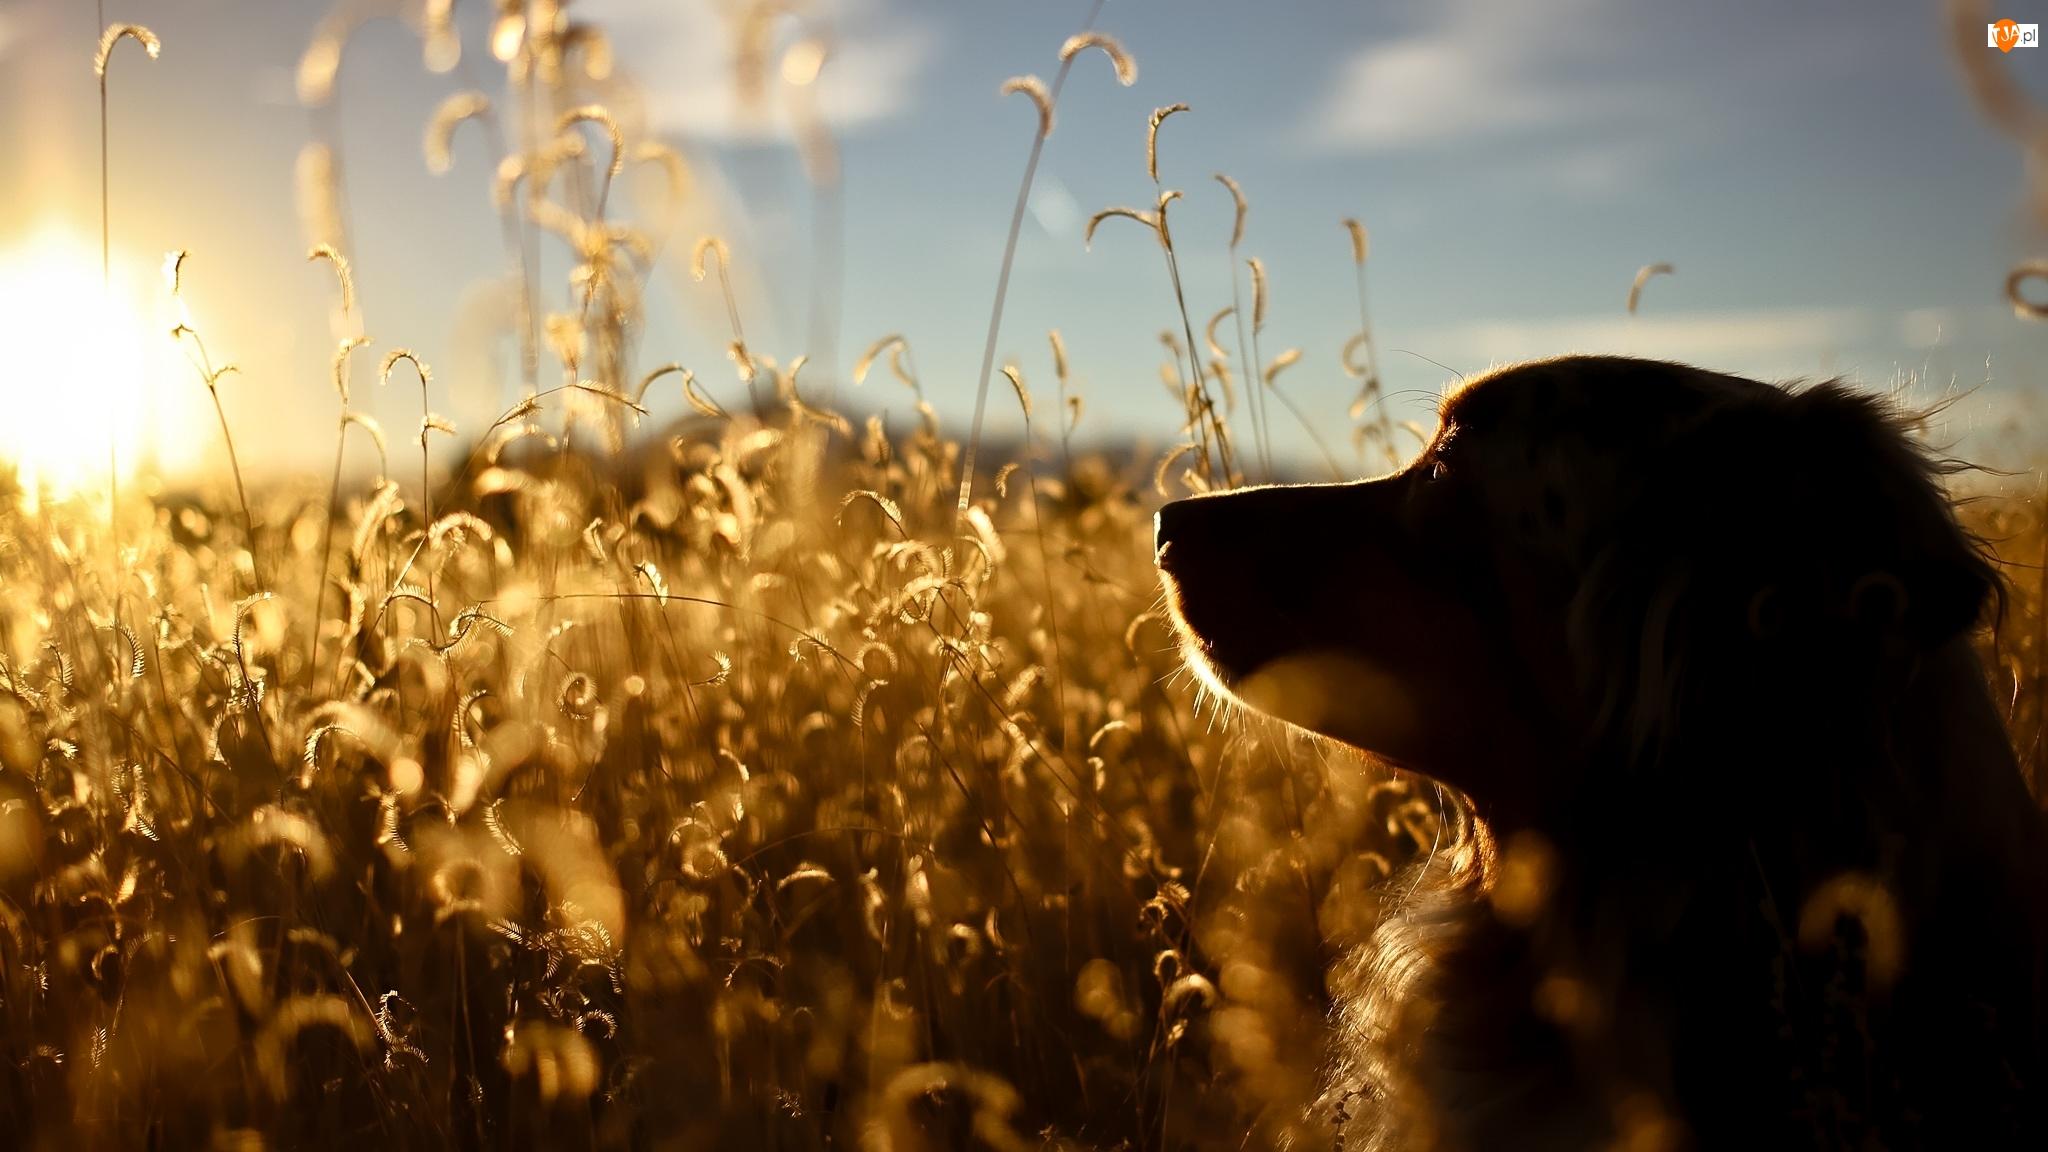 Rośliny, Słońce, Mordka, Pies, Łąka